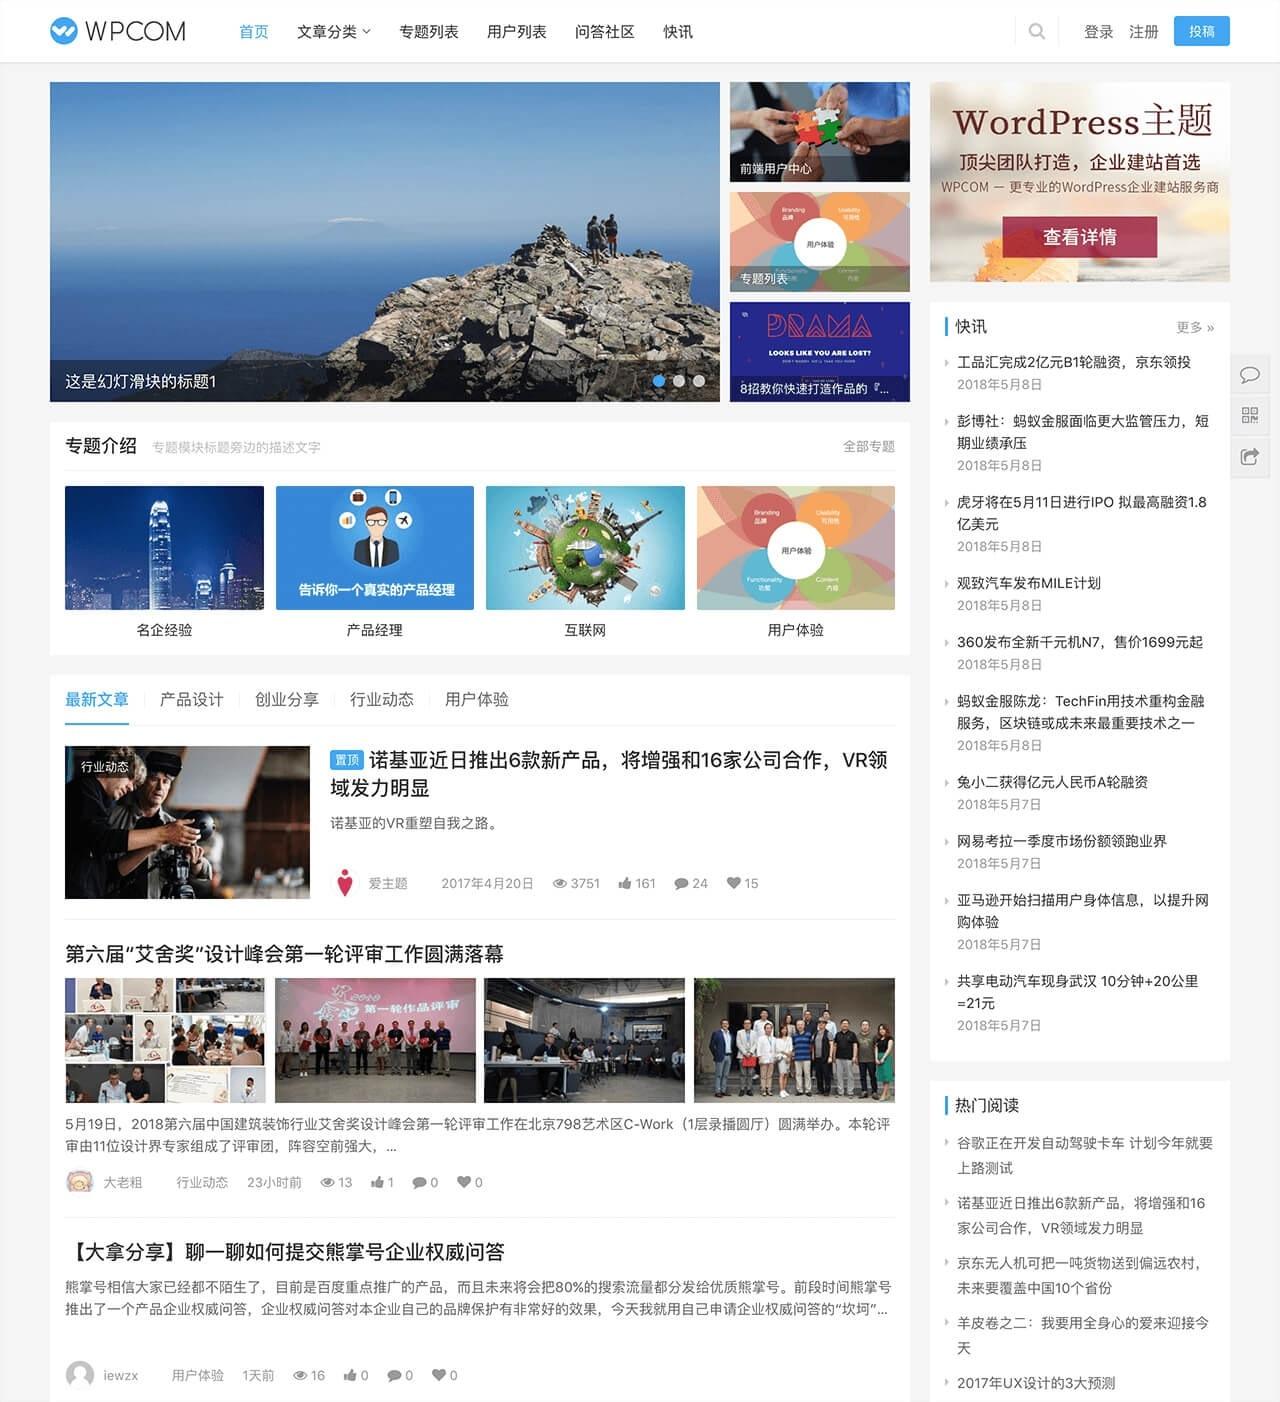 Wordpress的justnews主题破解去授权无限制版本V4.3.0(跟新V5.2.3)